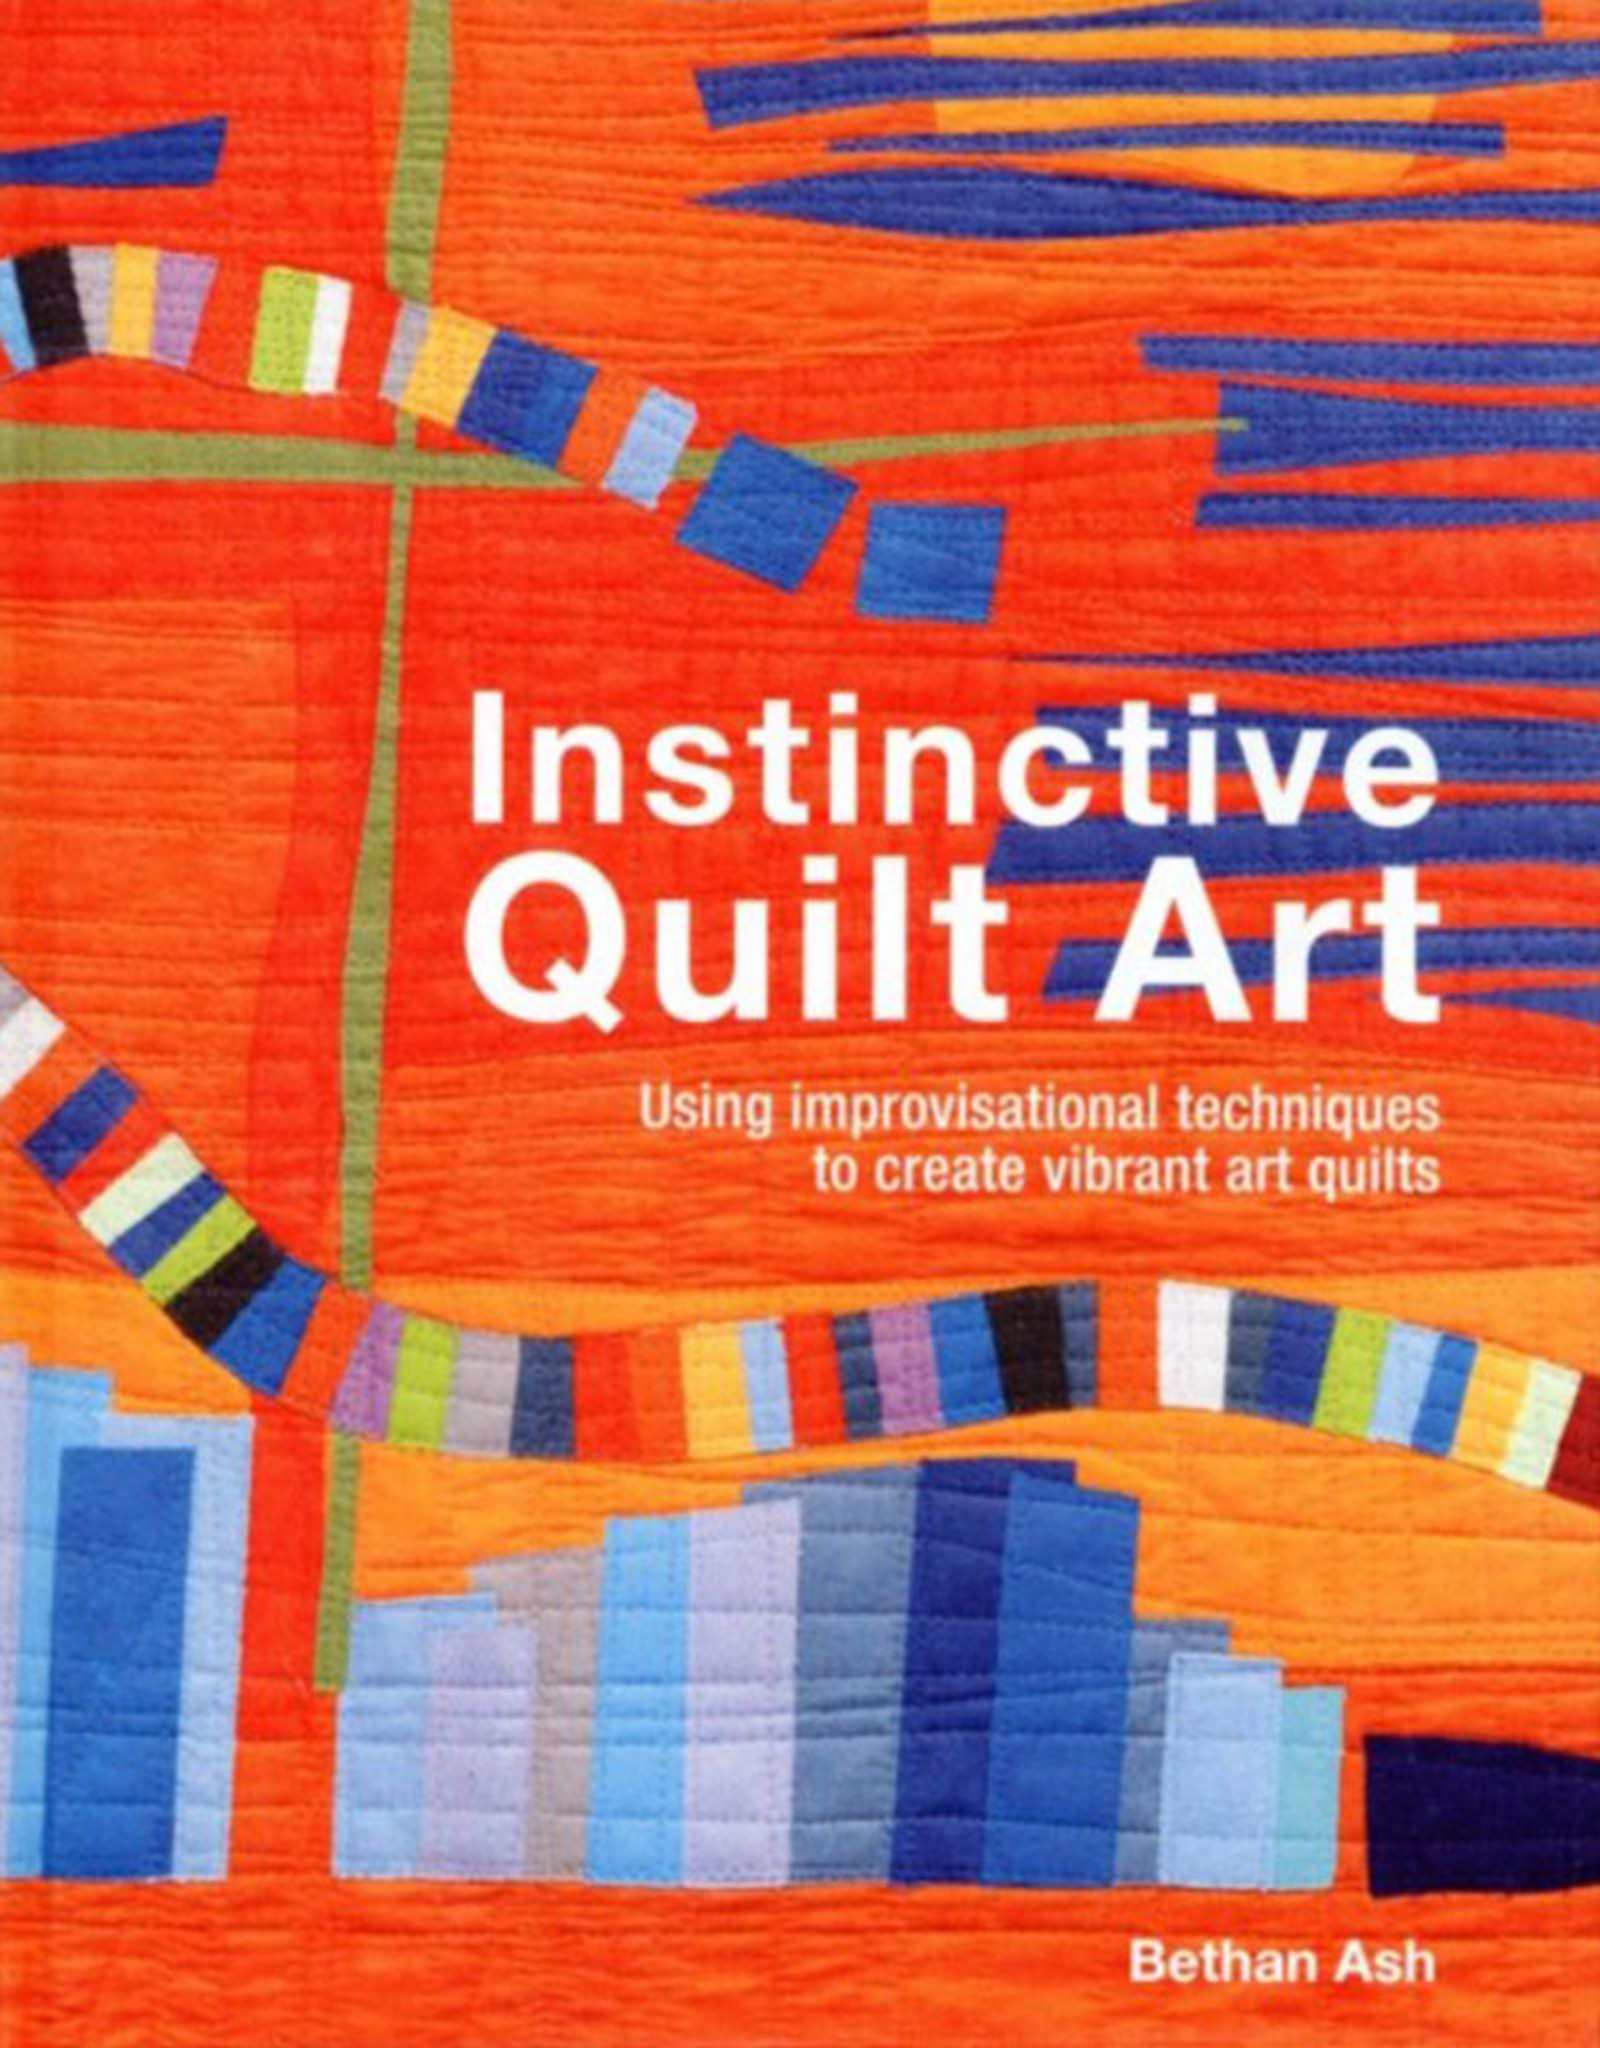 Instinctive Quilt Art / Bethan Ash